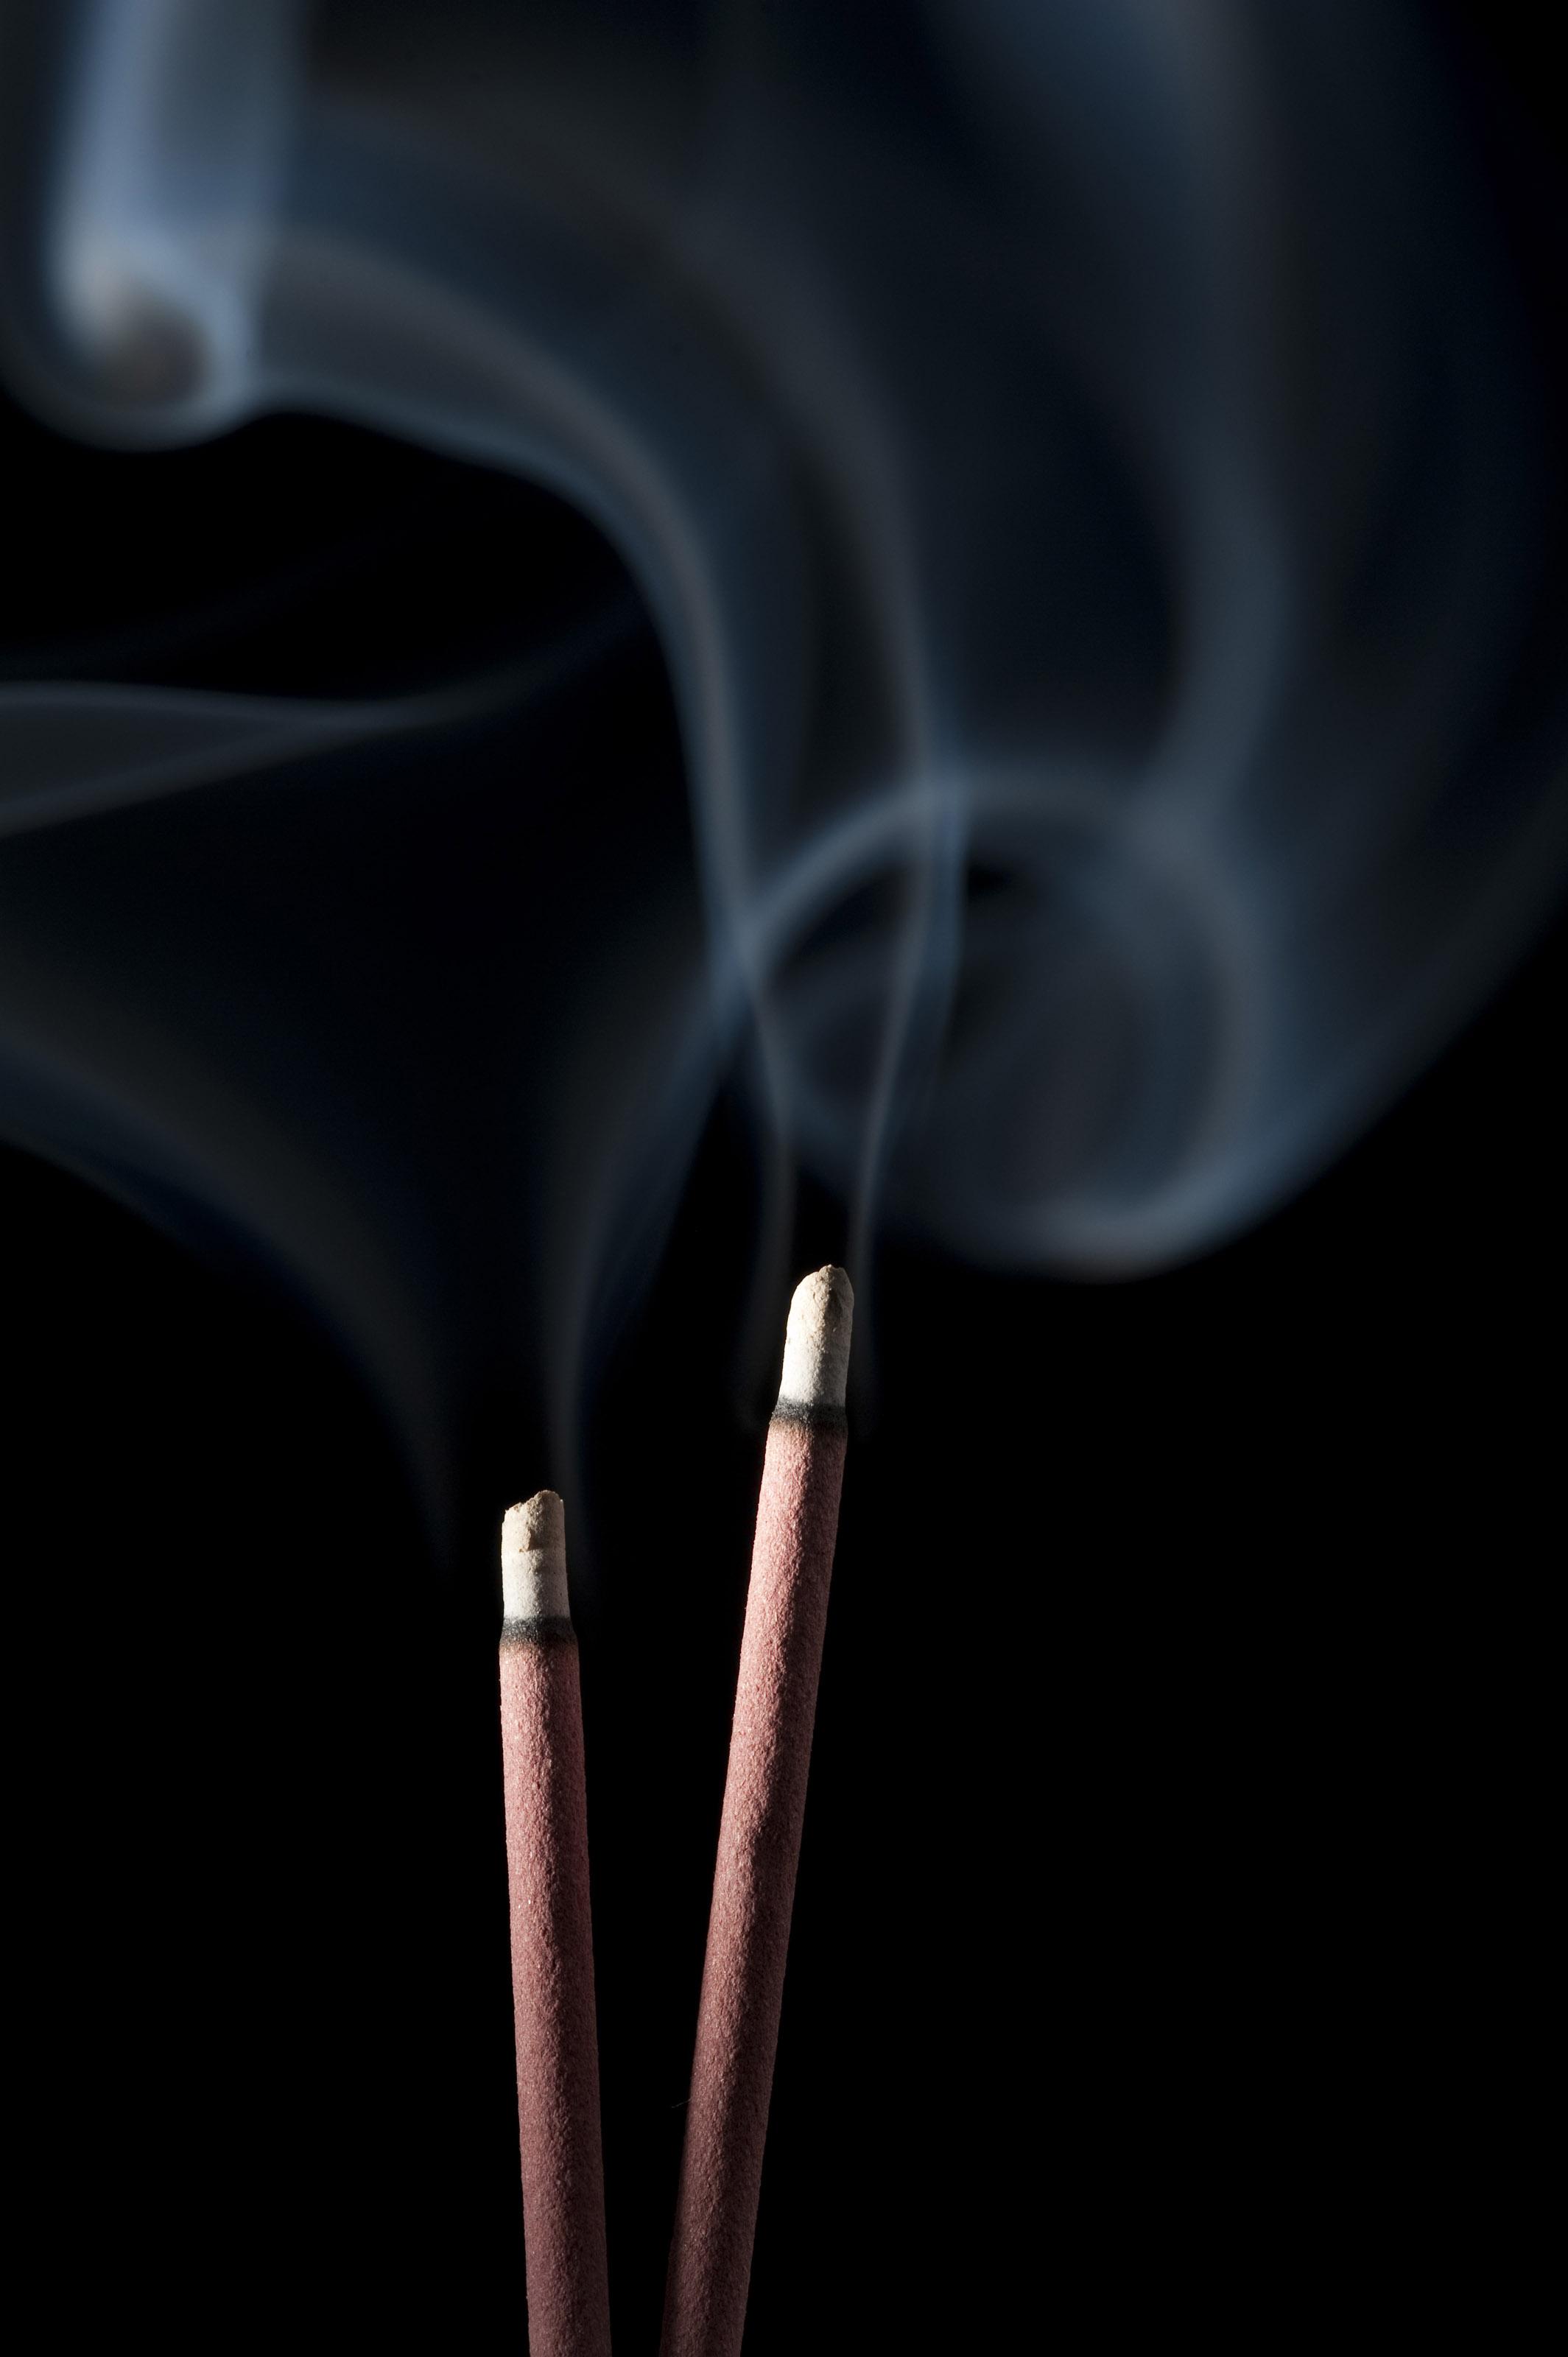 Free Stock Photo 4557 burning incense | freeimageslive